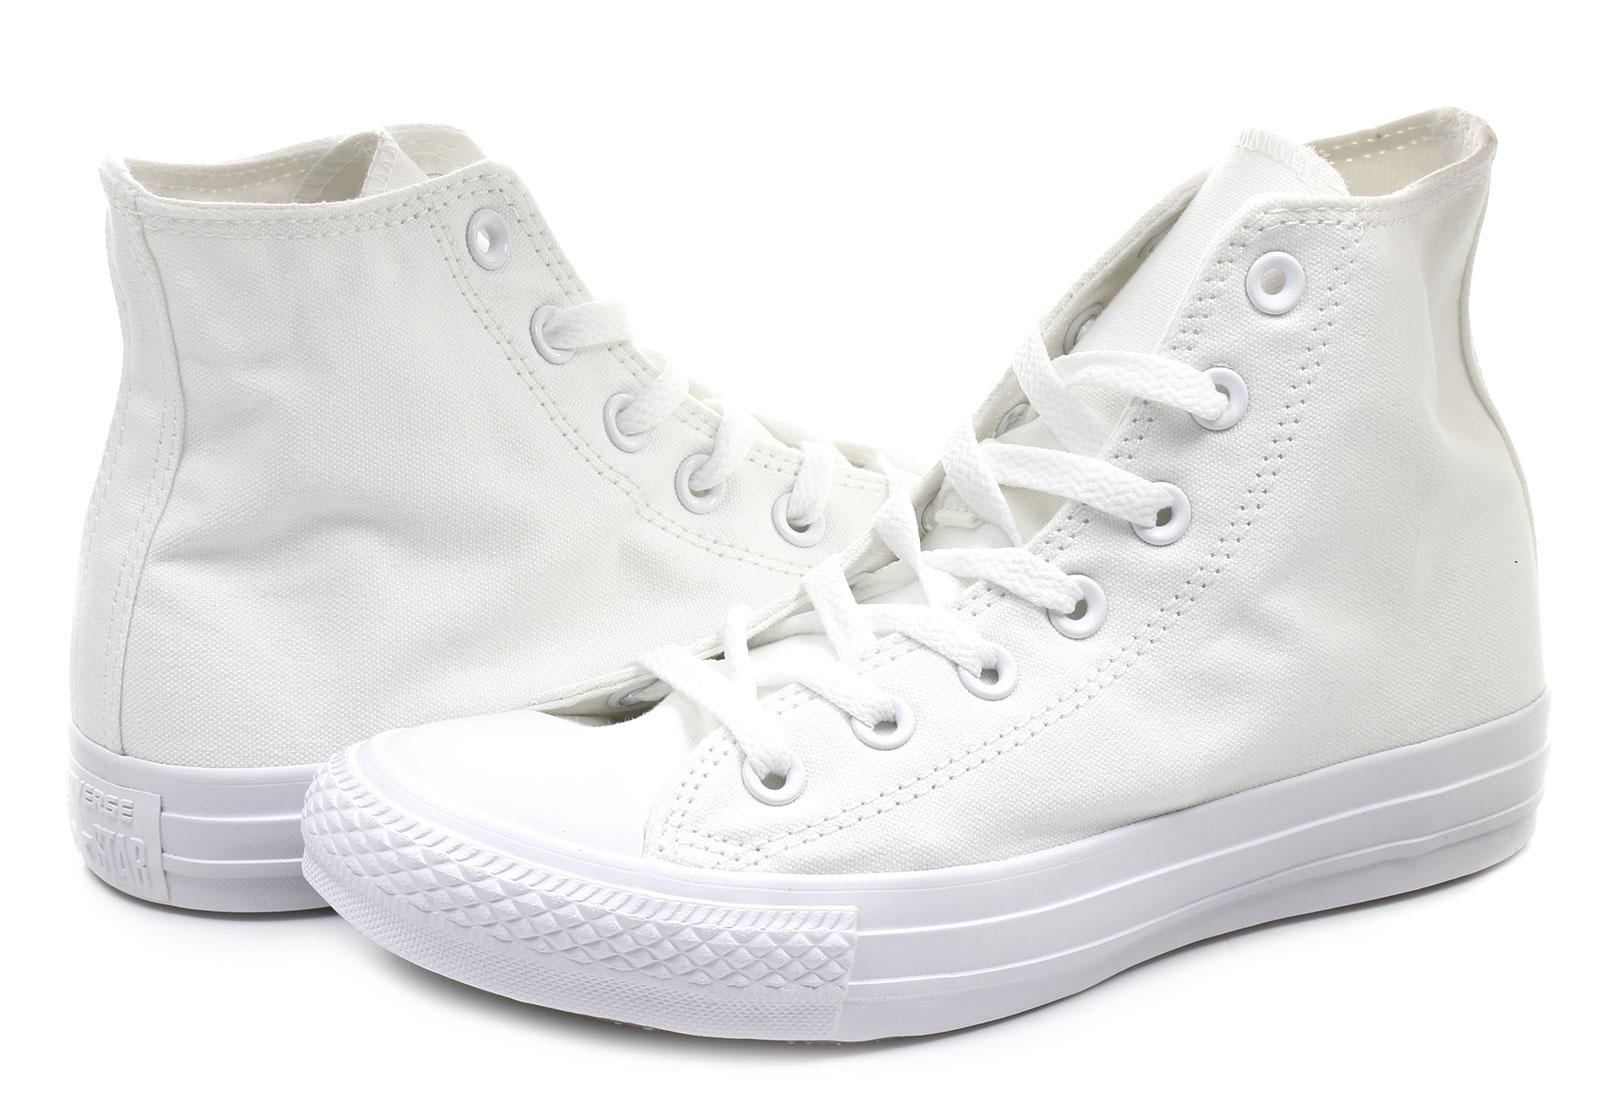 Converse Tornacipő Chuck Taylor All Star Core Hi 1U646C Office Shoes Magyarország